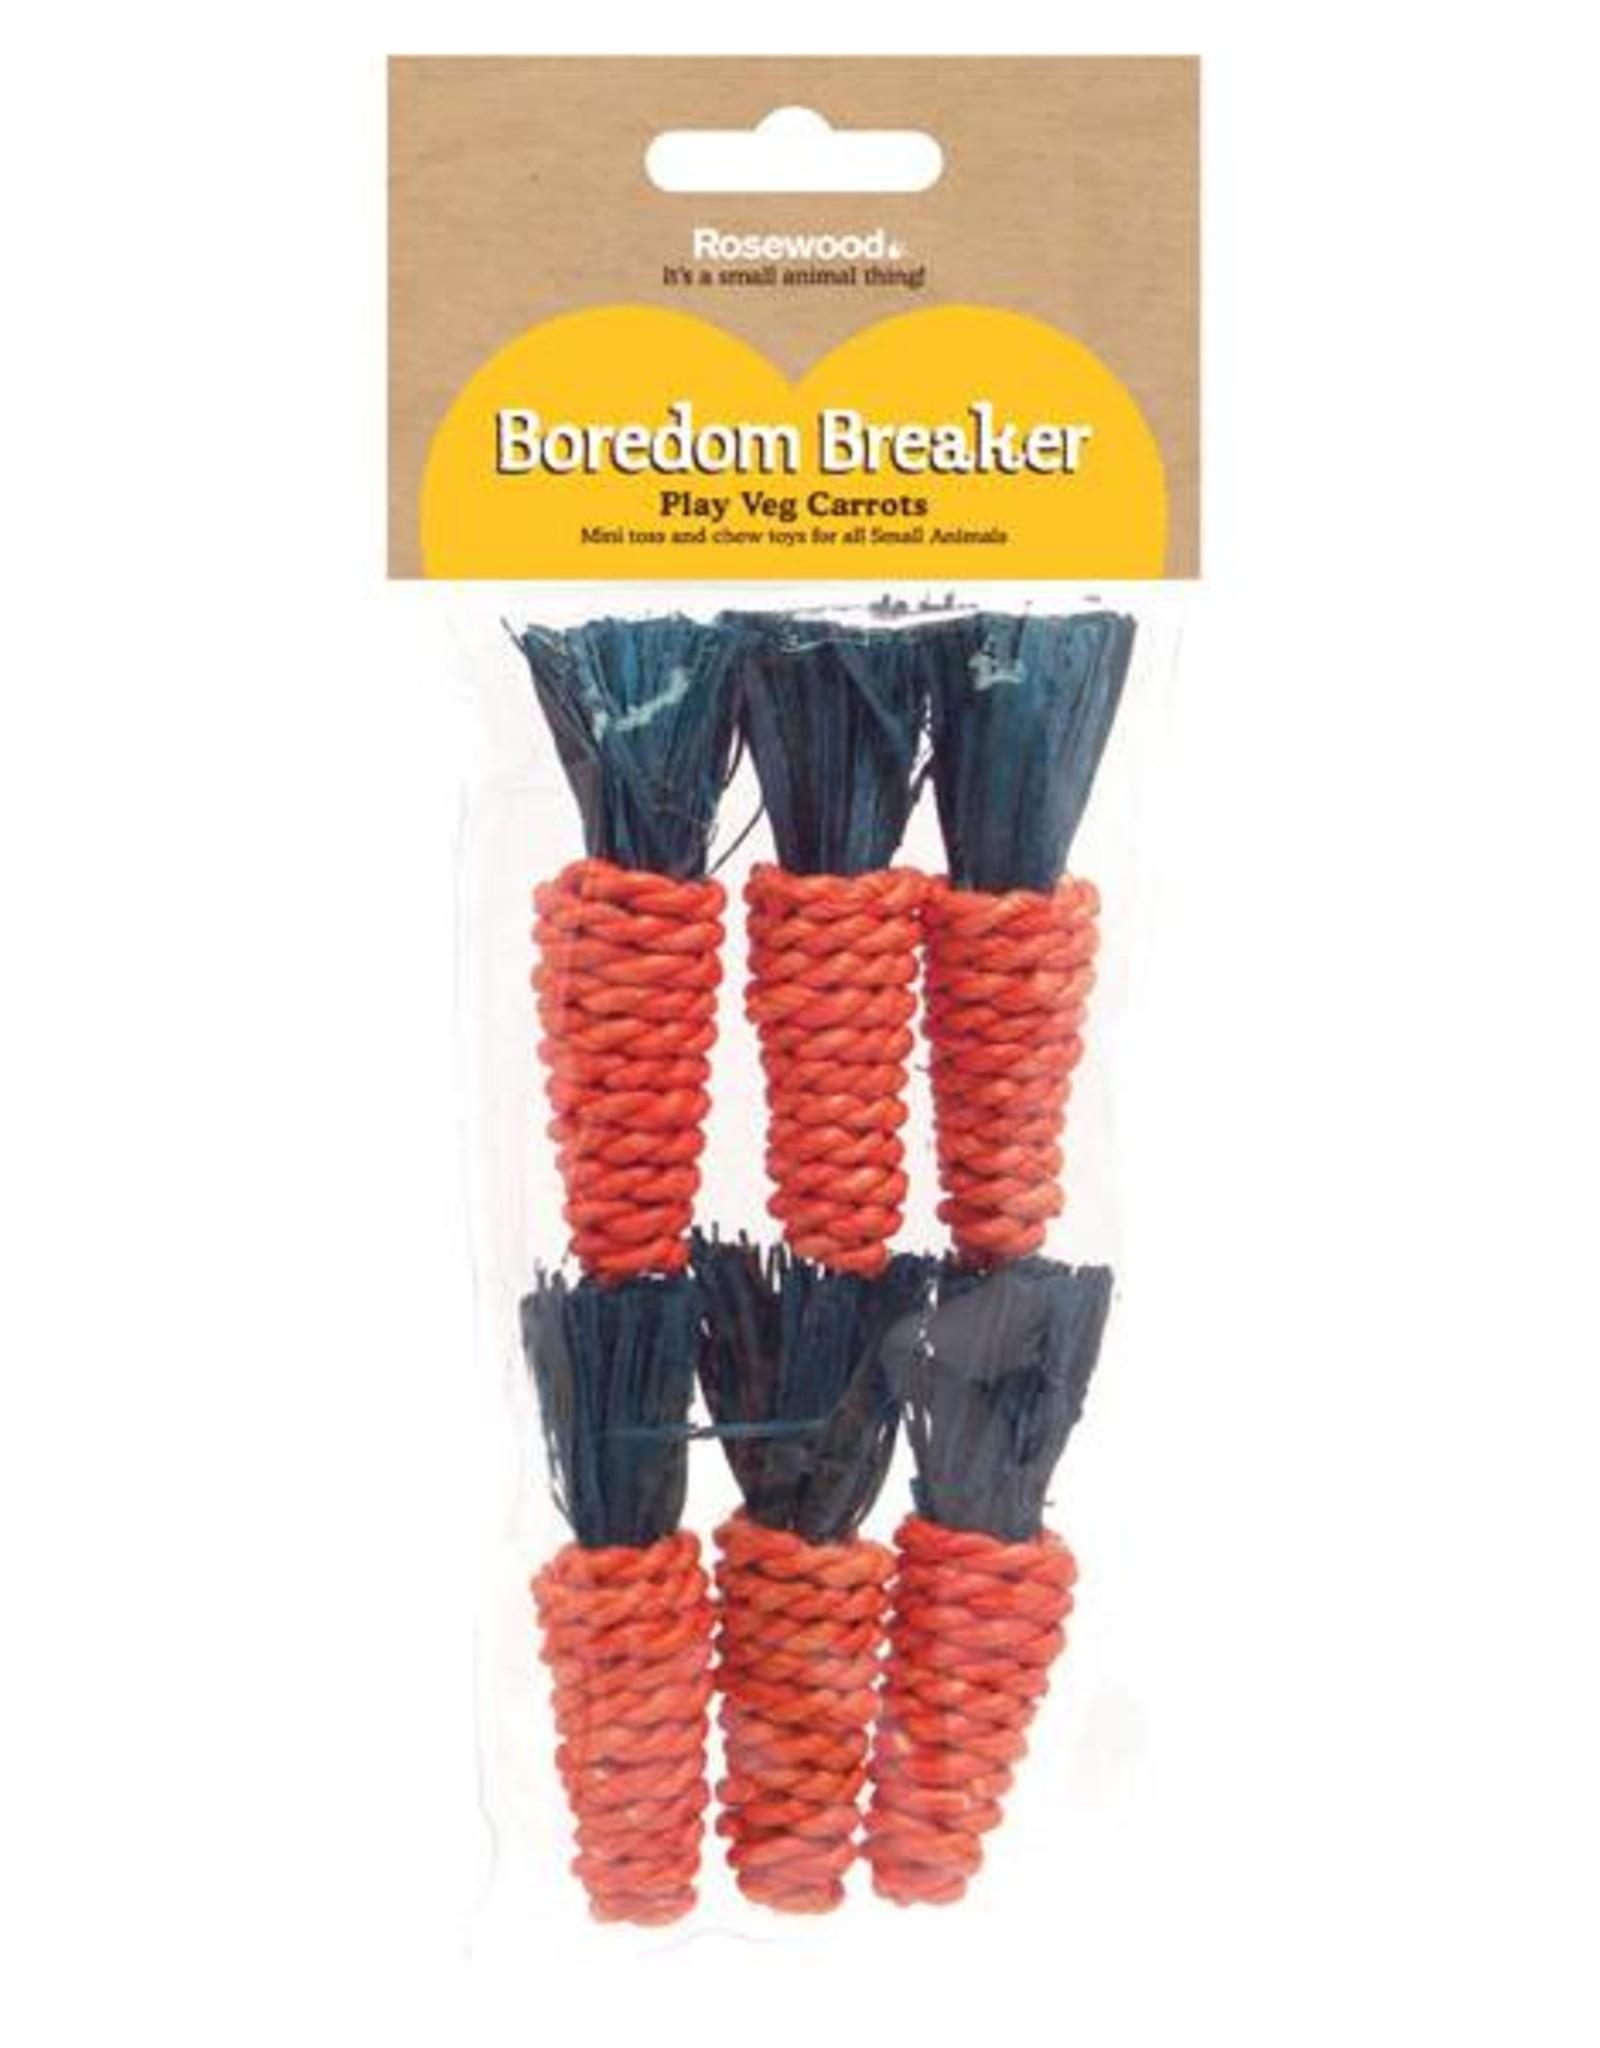 Rosewood Boredom Breaker Corn Wood & Sisal Toys 6 pack Mini Sisal Carrots